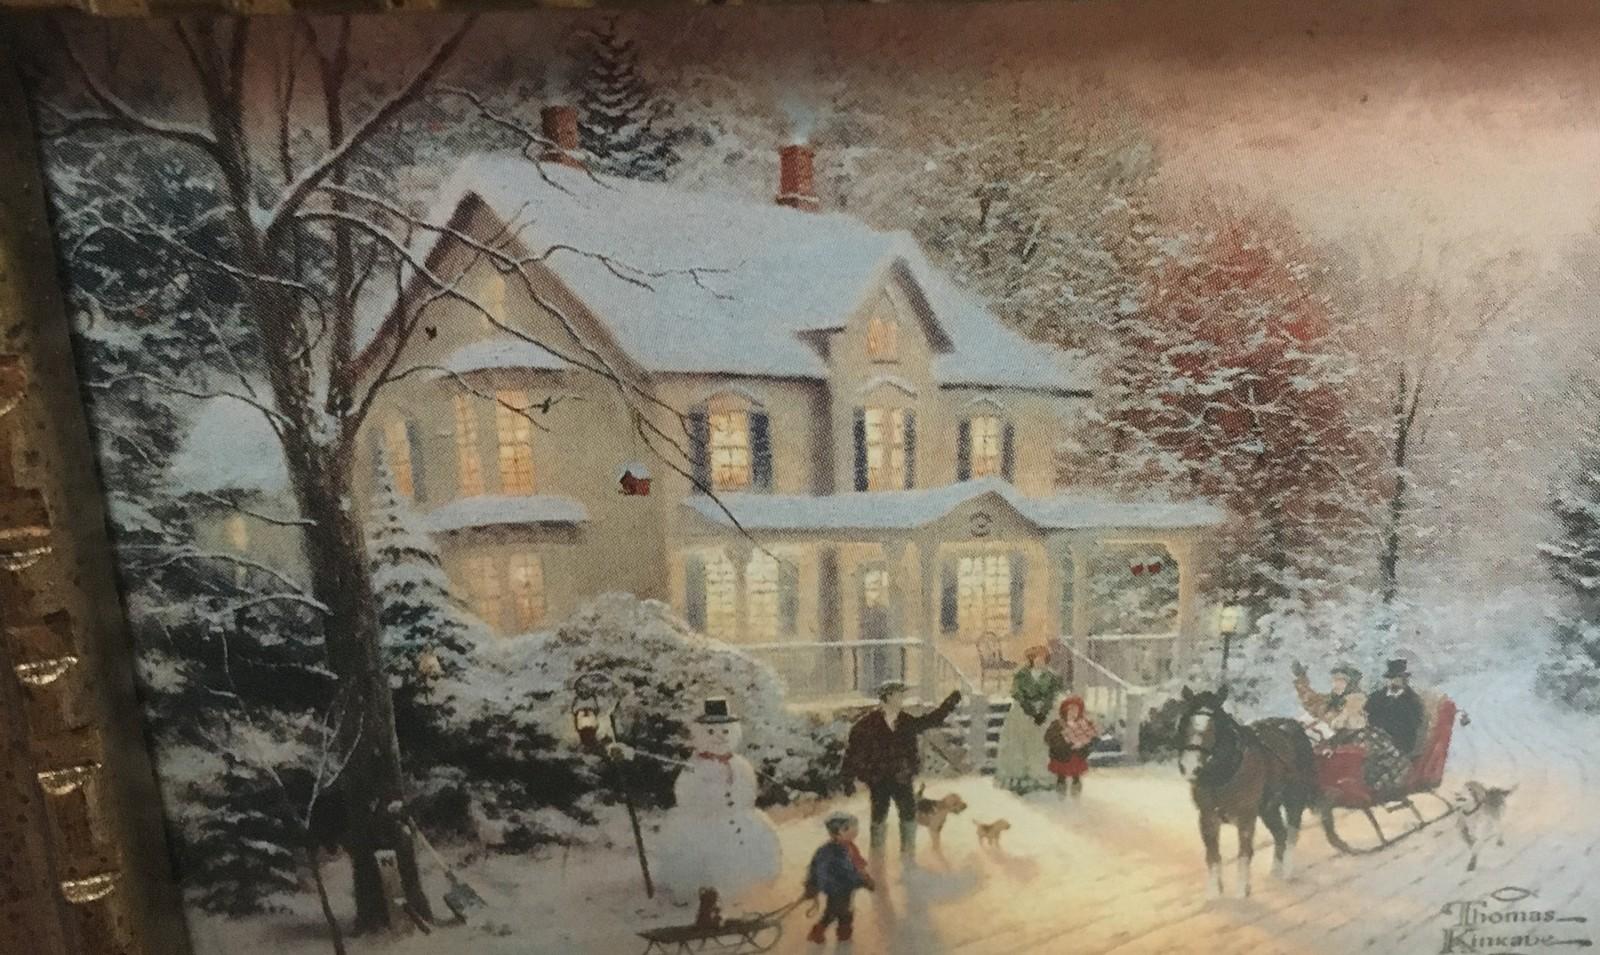 Hallmark 2000 Thomas Kinkade Miniature Framed Art Home For The Holidays